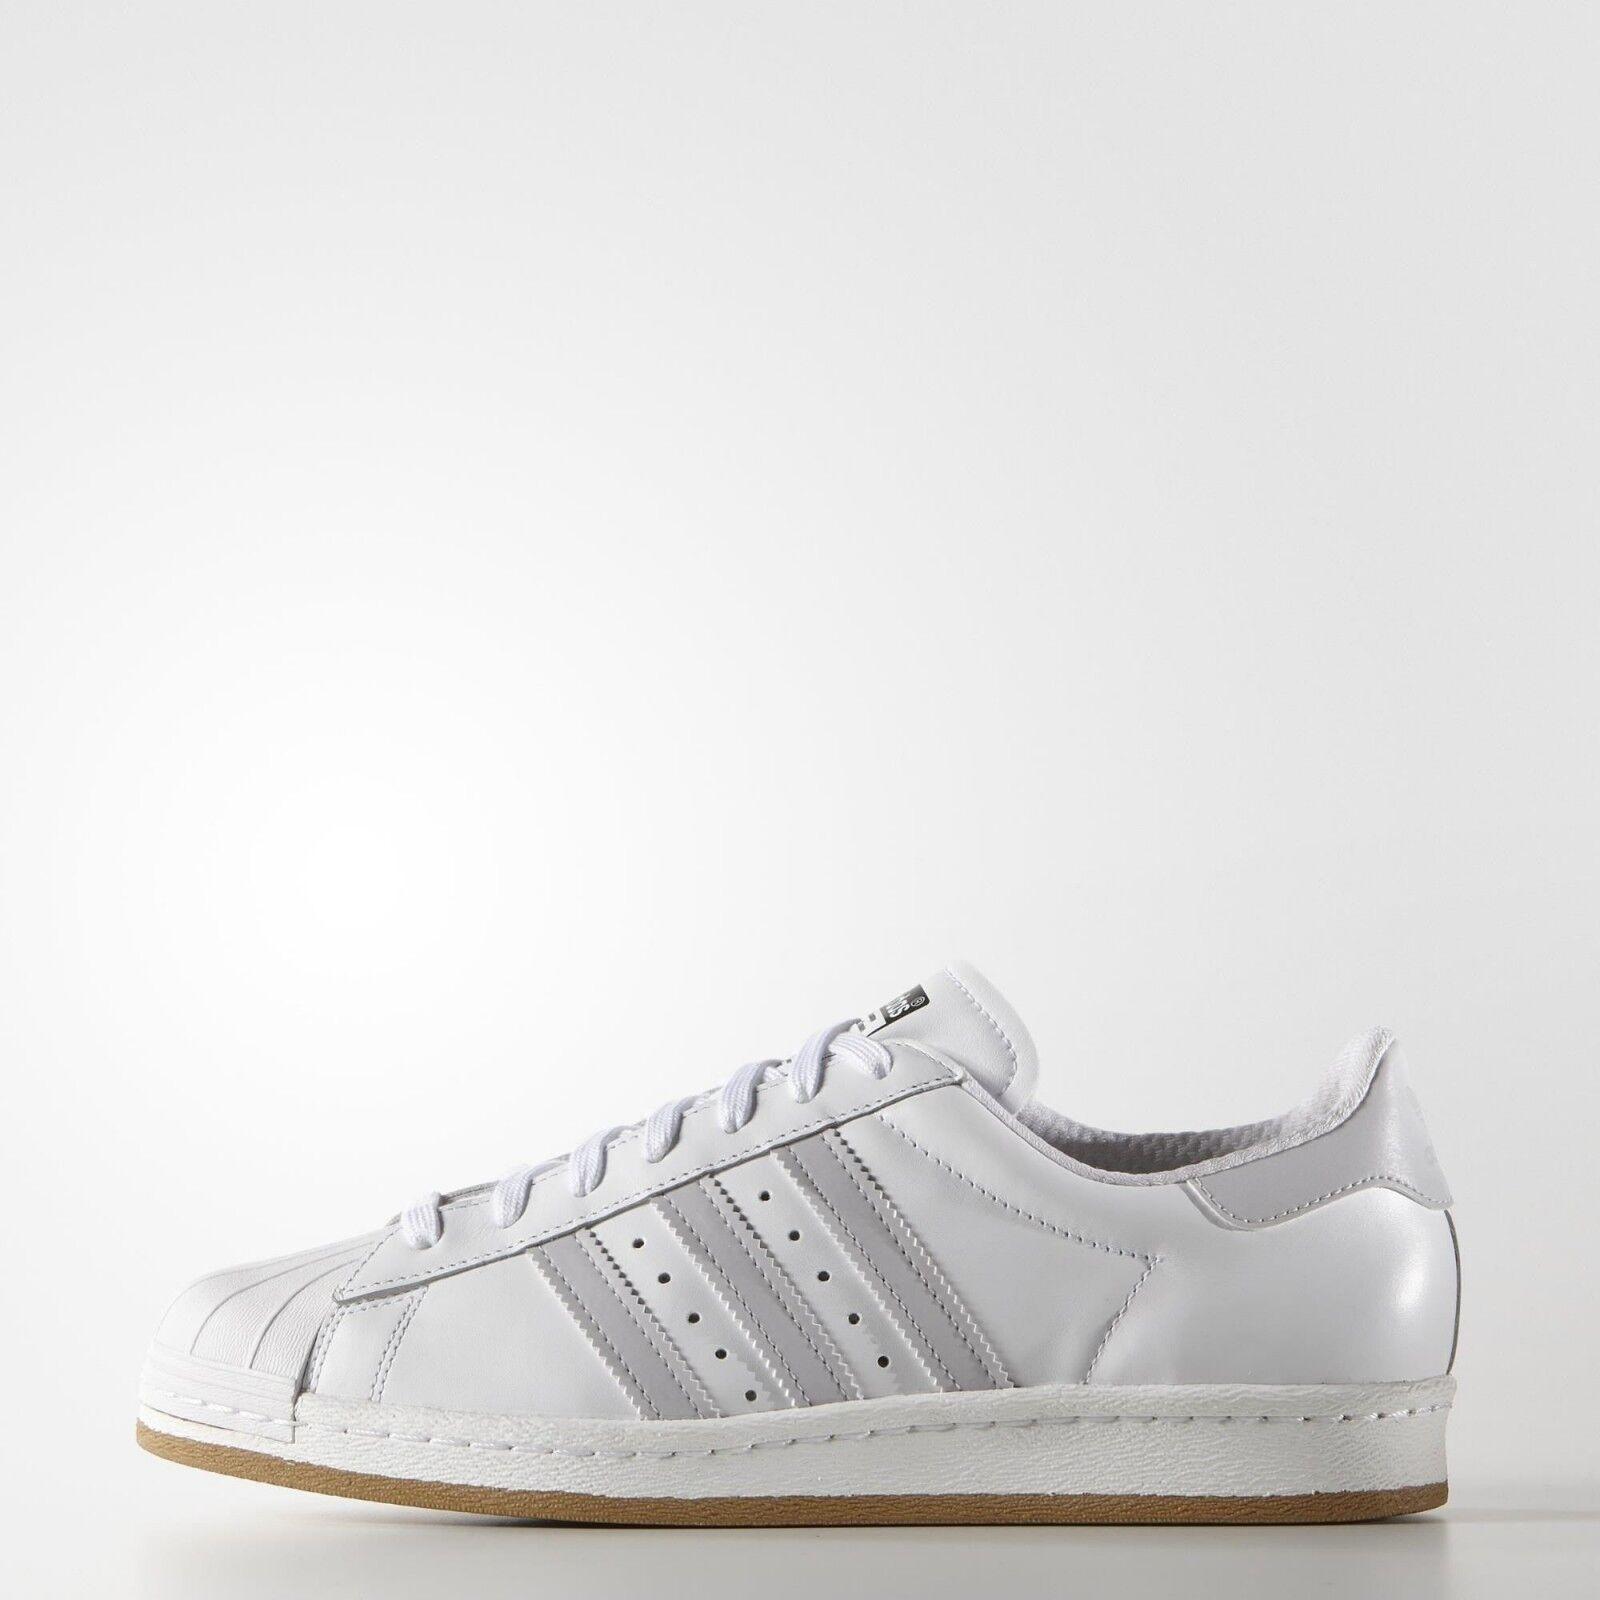 Adidas Superstar 80's Reflective Nite Jogger Weiß  UK 8